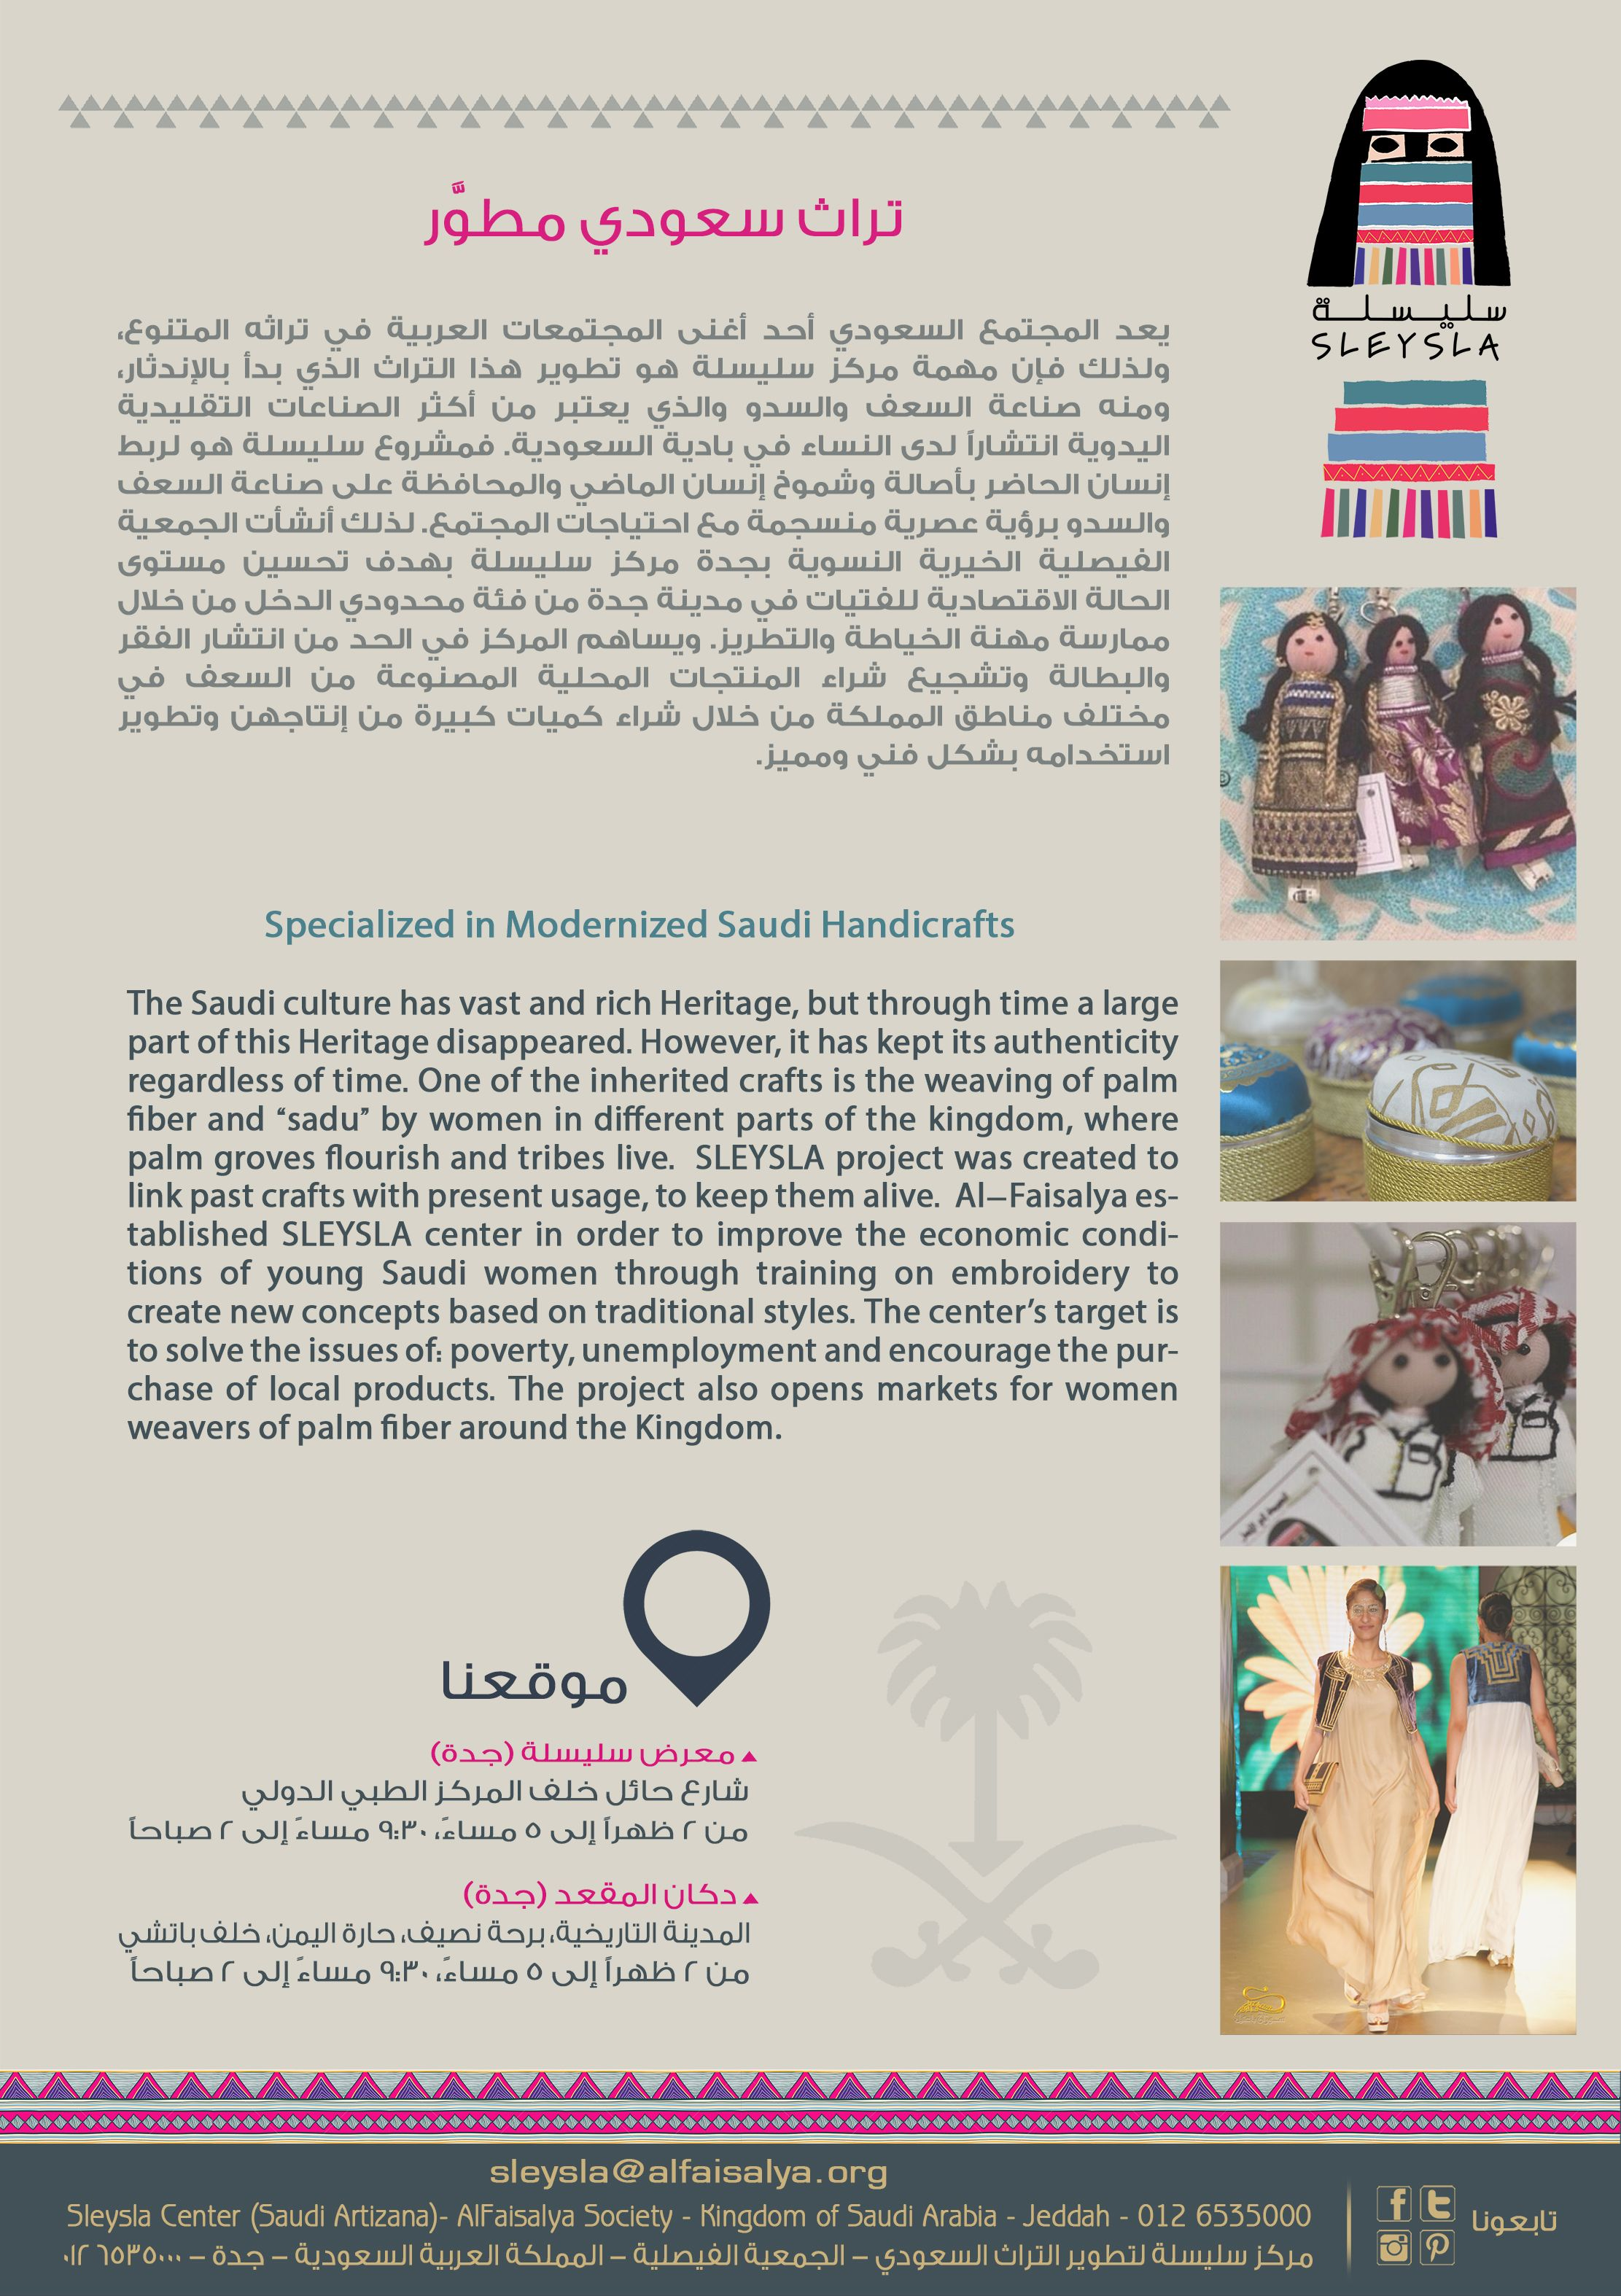 Sleysla Specialized In Modernized Saudi Handicrafts Handicraft Event Special